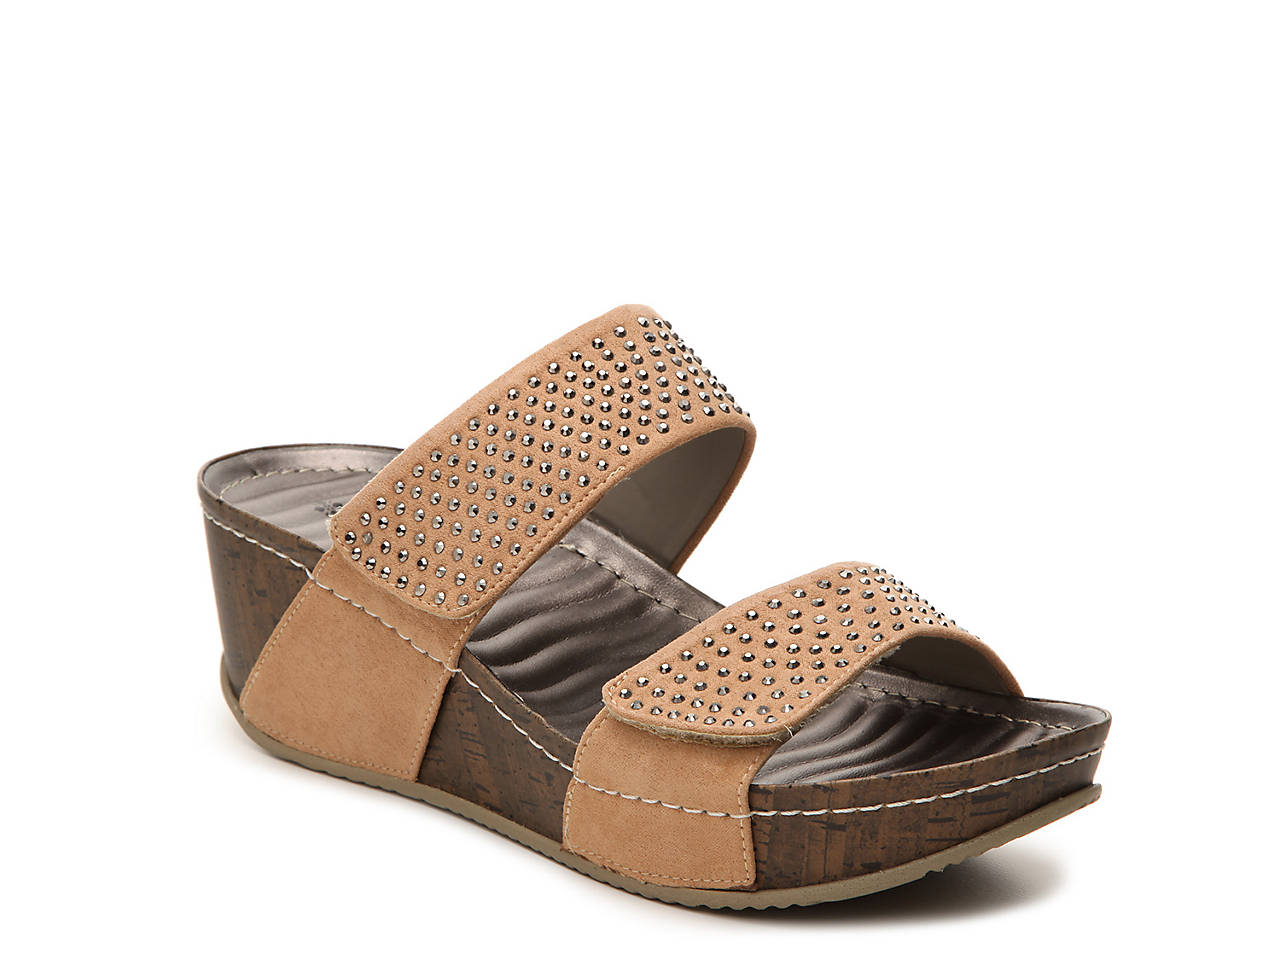 fbe99d22b61b Patrizia by Spring Step Delphine Wedge Sandal Women s Shoes